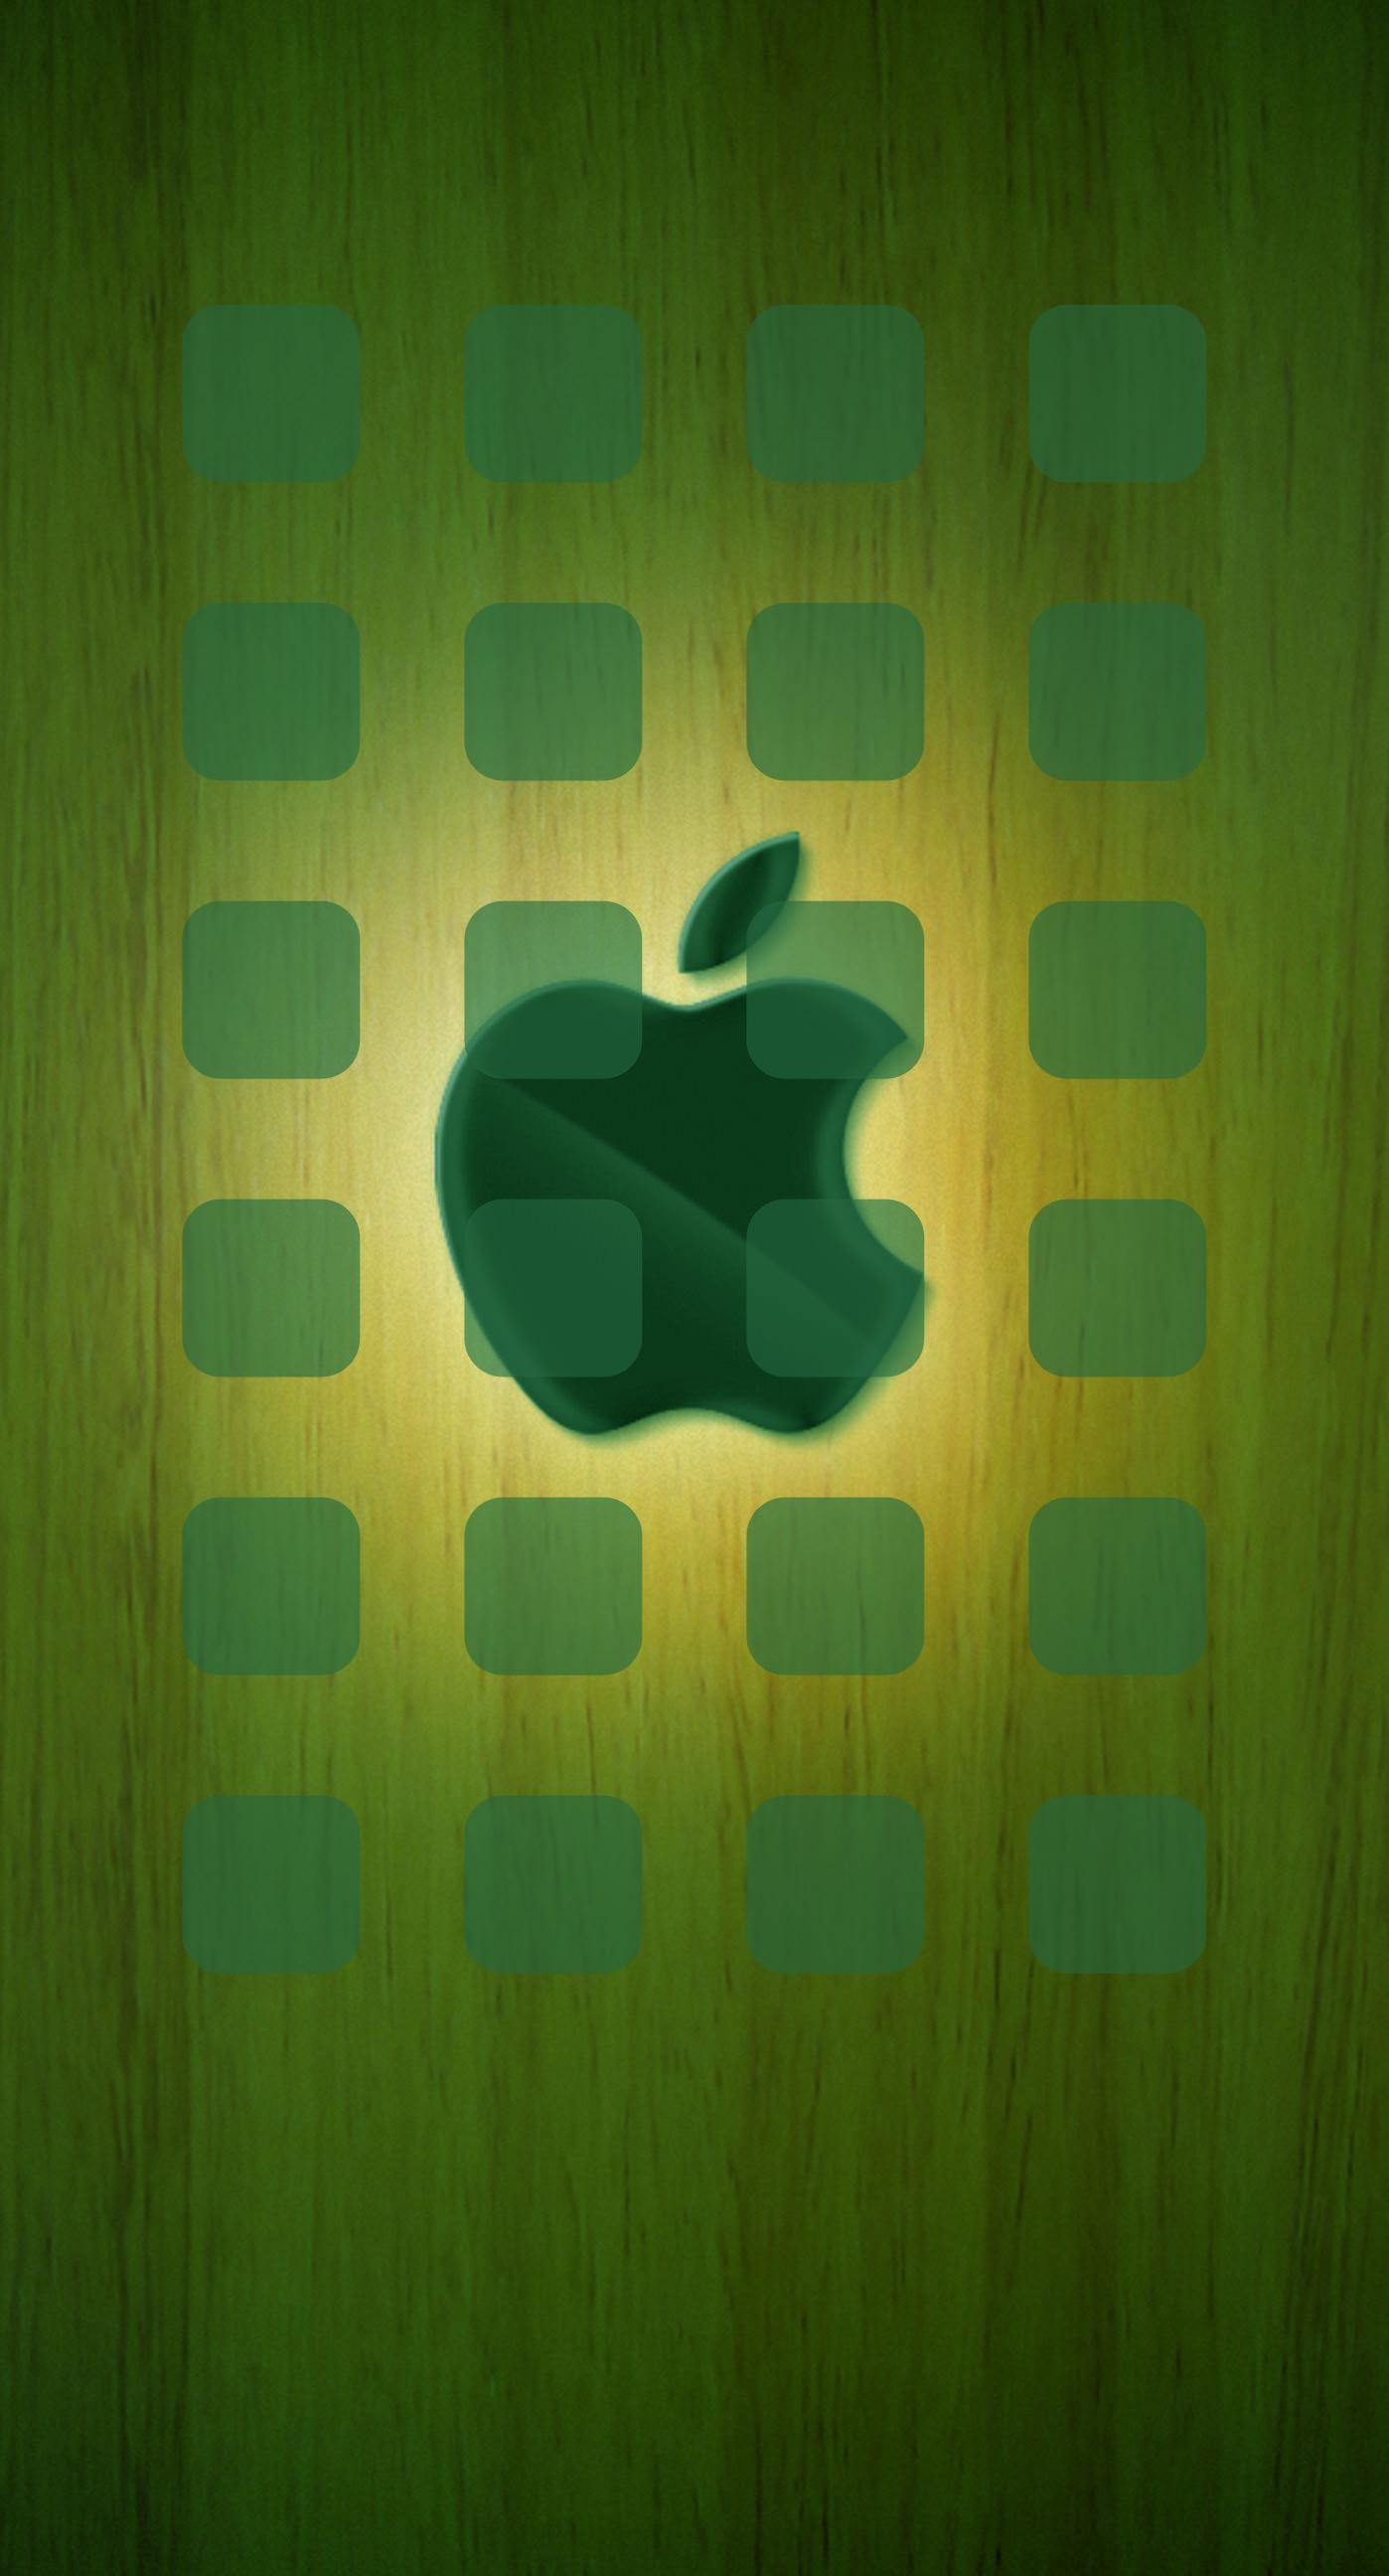 Apple Logo Shelf Cool Plate Yellow Green Wallpaper Sc